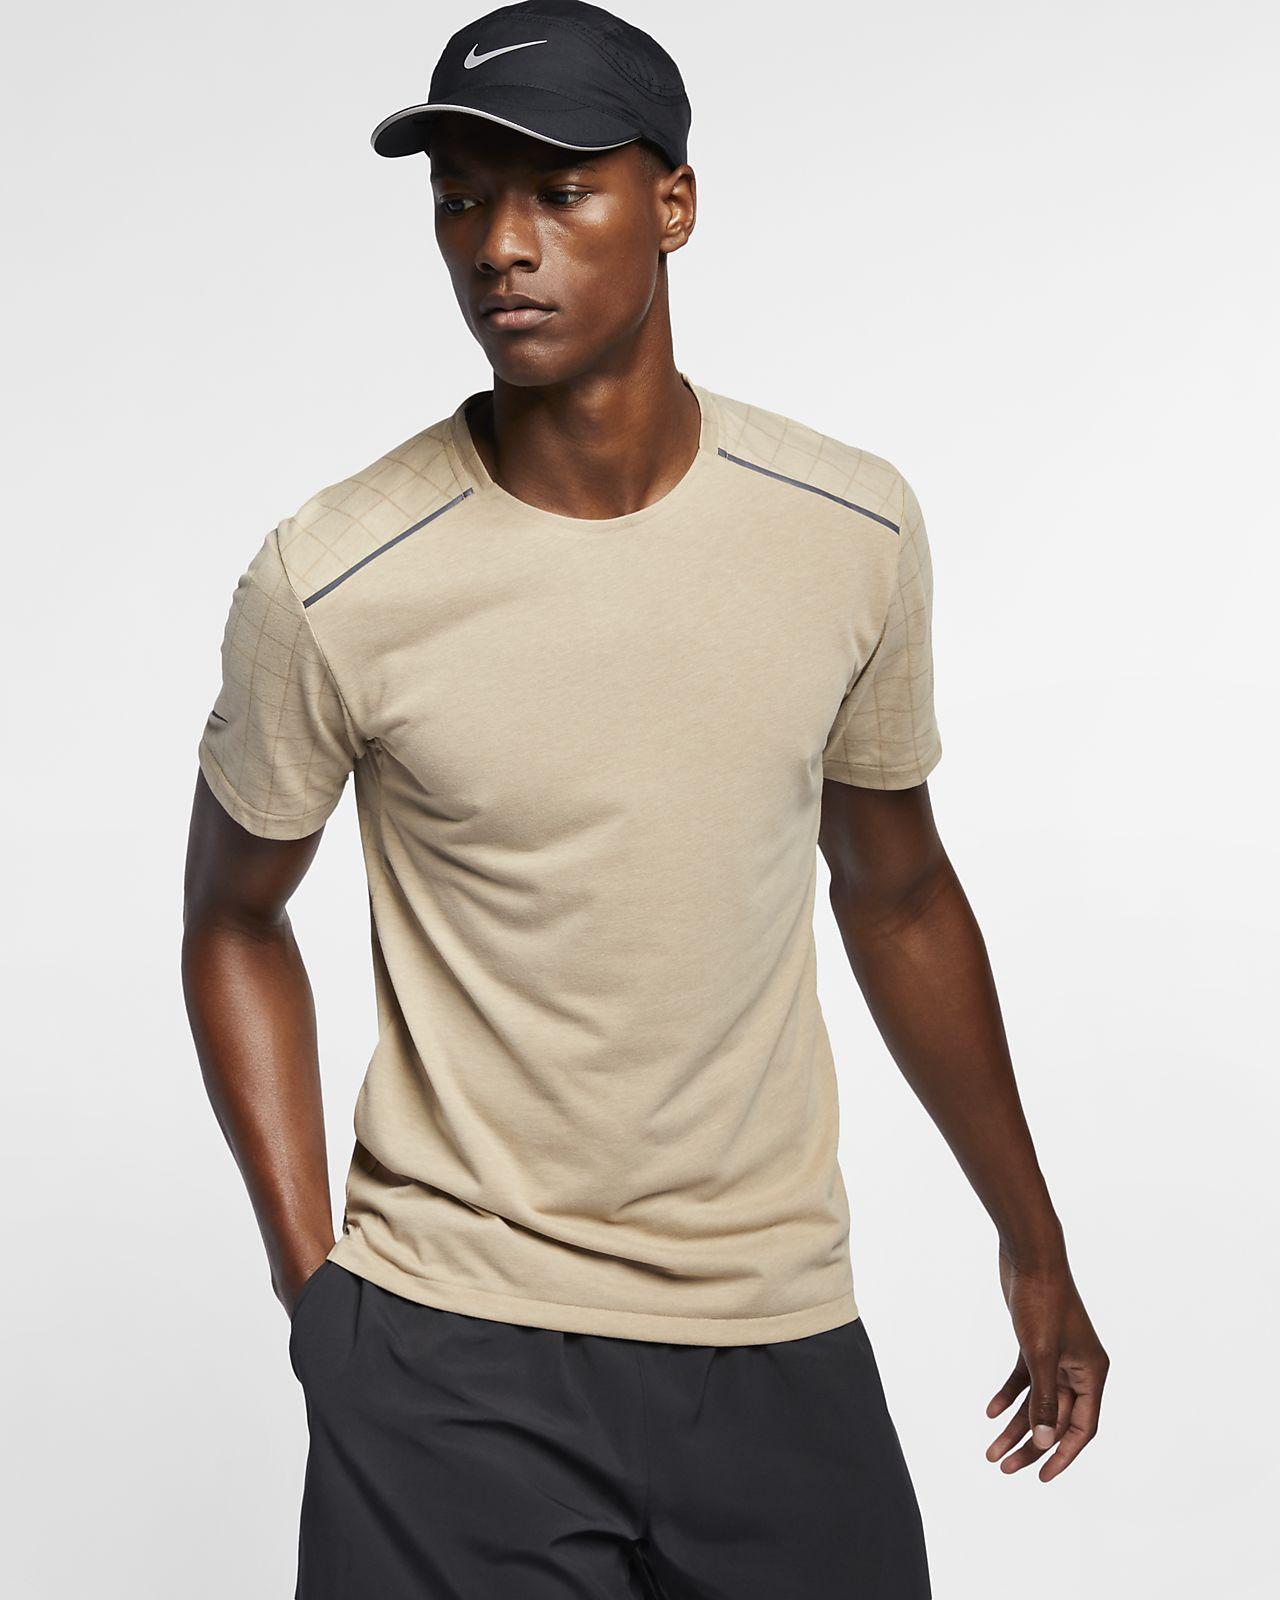 Camisola de running Nike Tech para homem